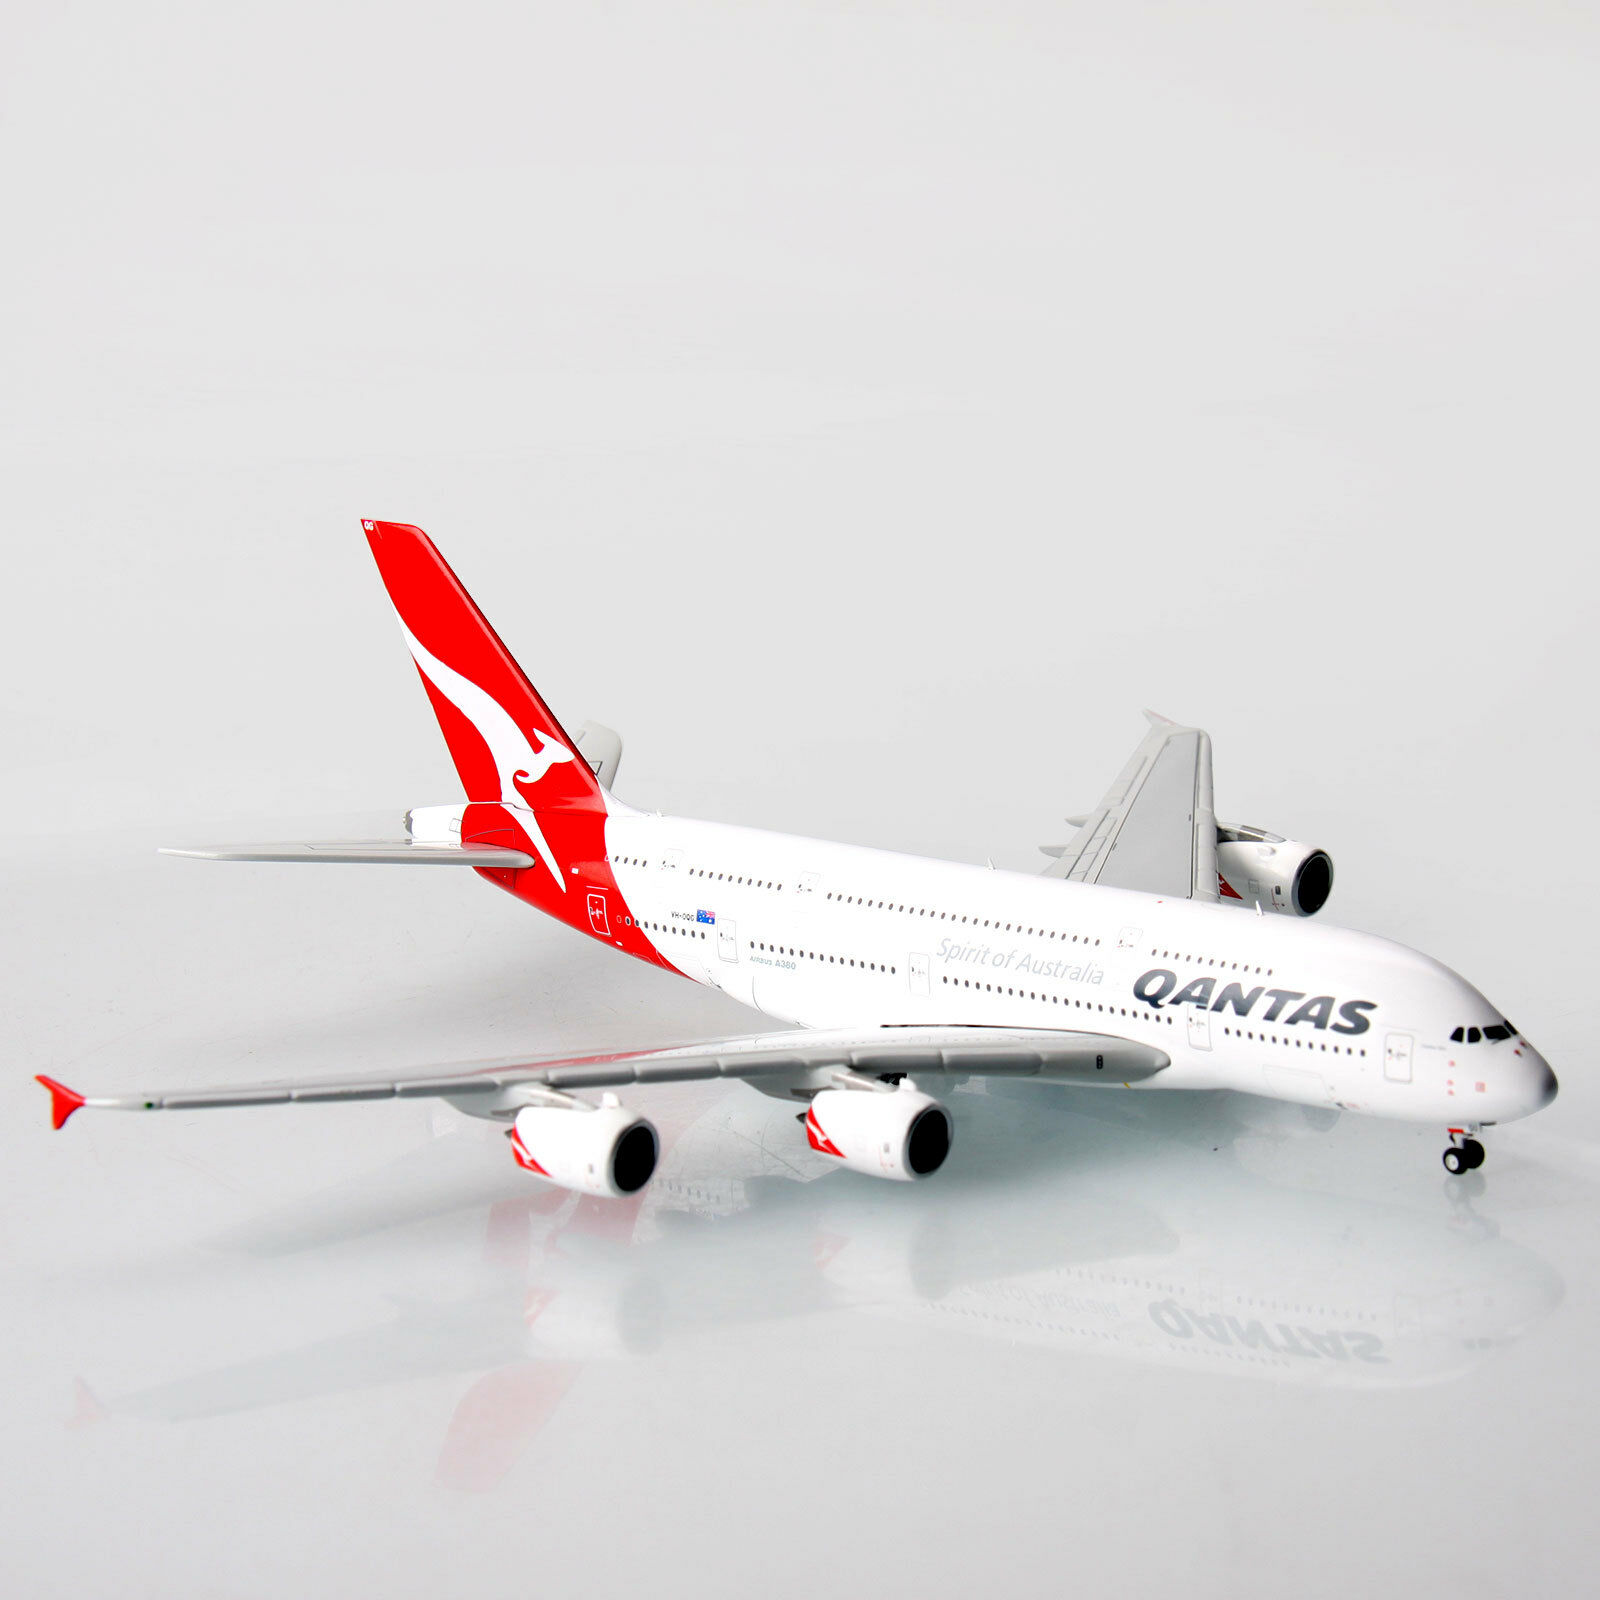 Qantas Airbus A380 VH-oqg 1 400 scale die-cast Modelo A380 réplica aviones